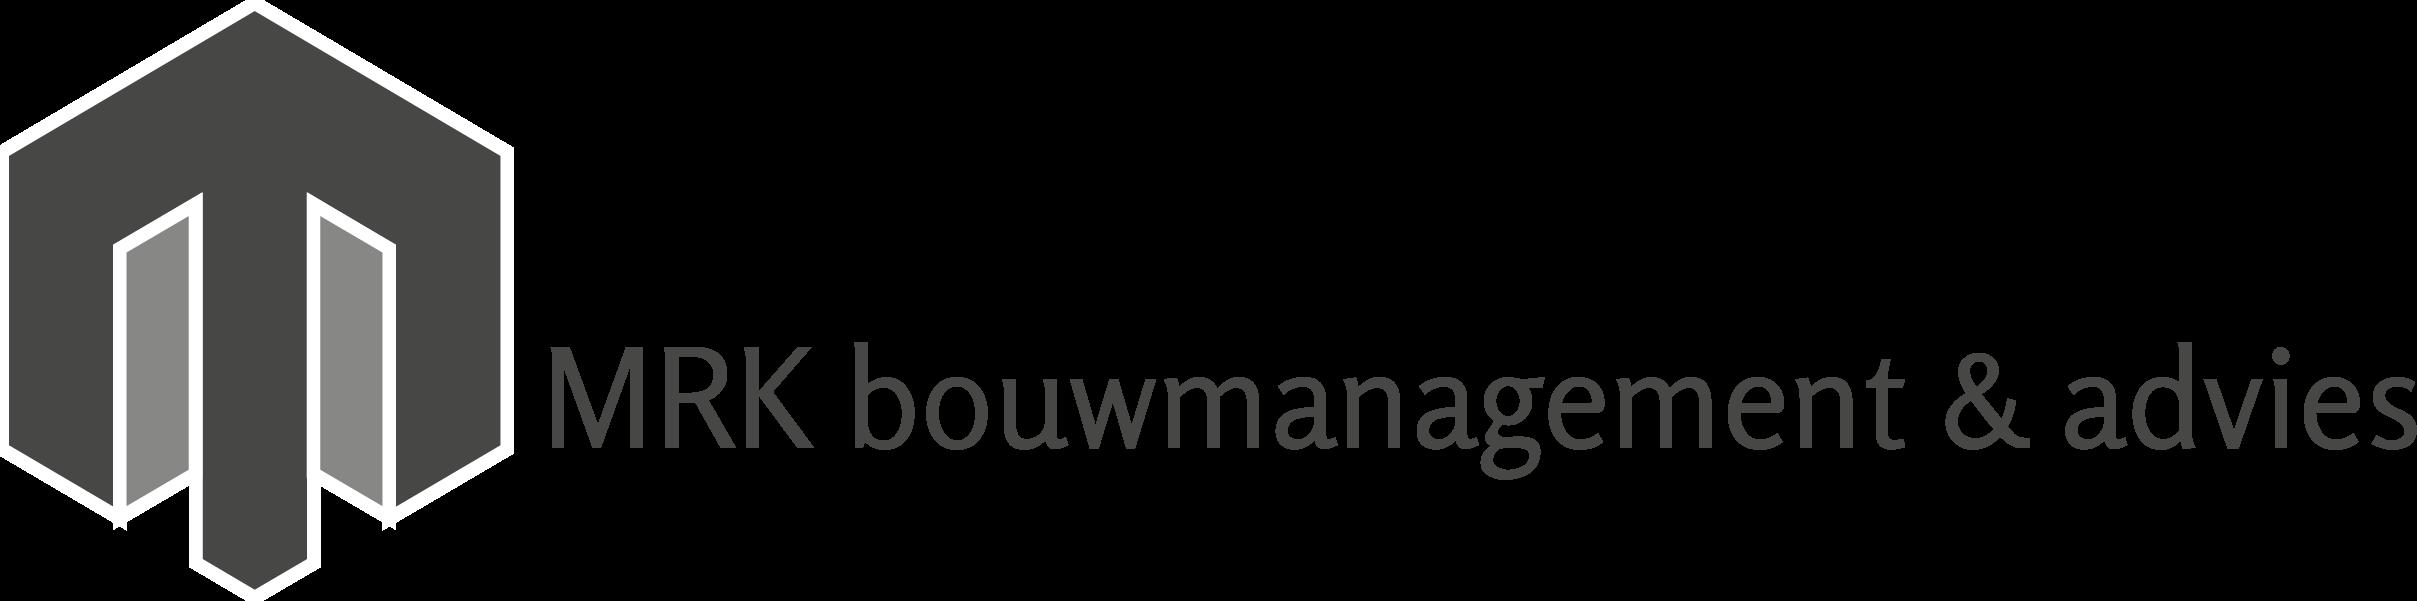 cropped-Grijs-logo.png